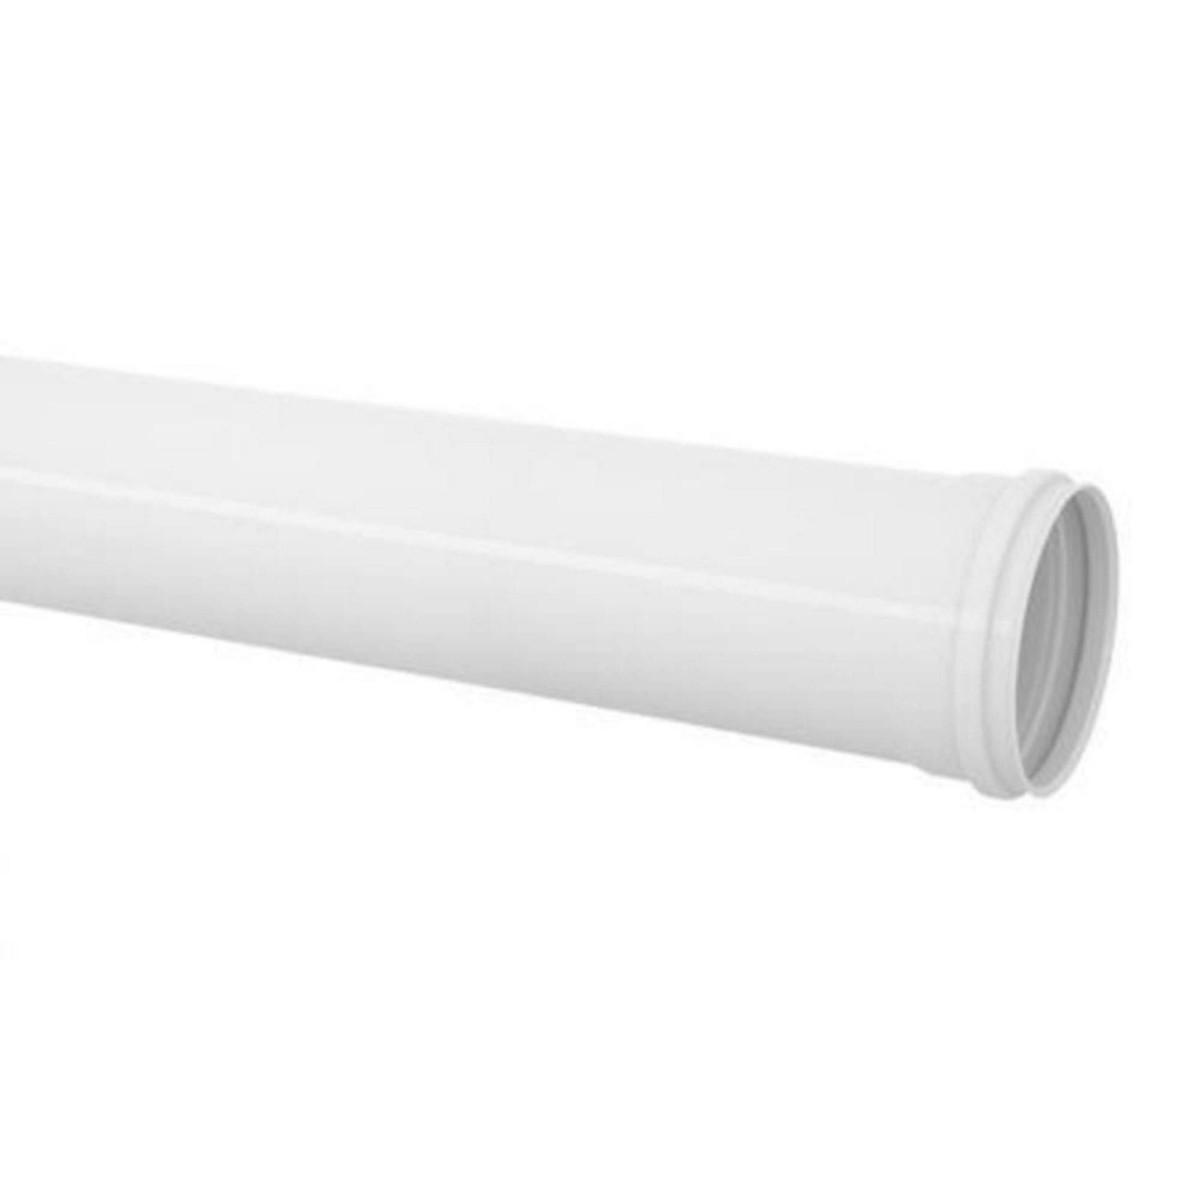 Esgoto Tubo Série Normal 100mm - 4